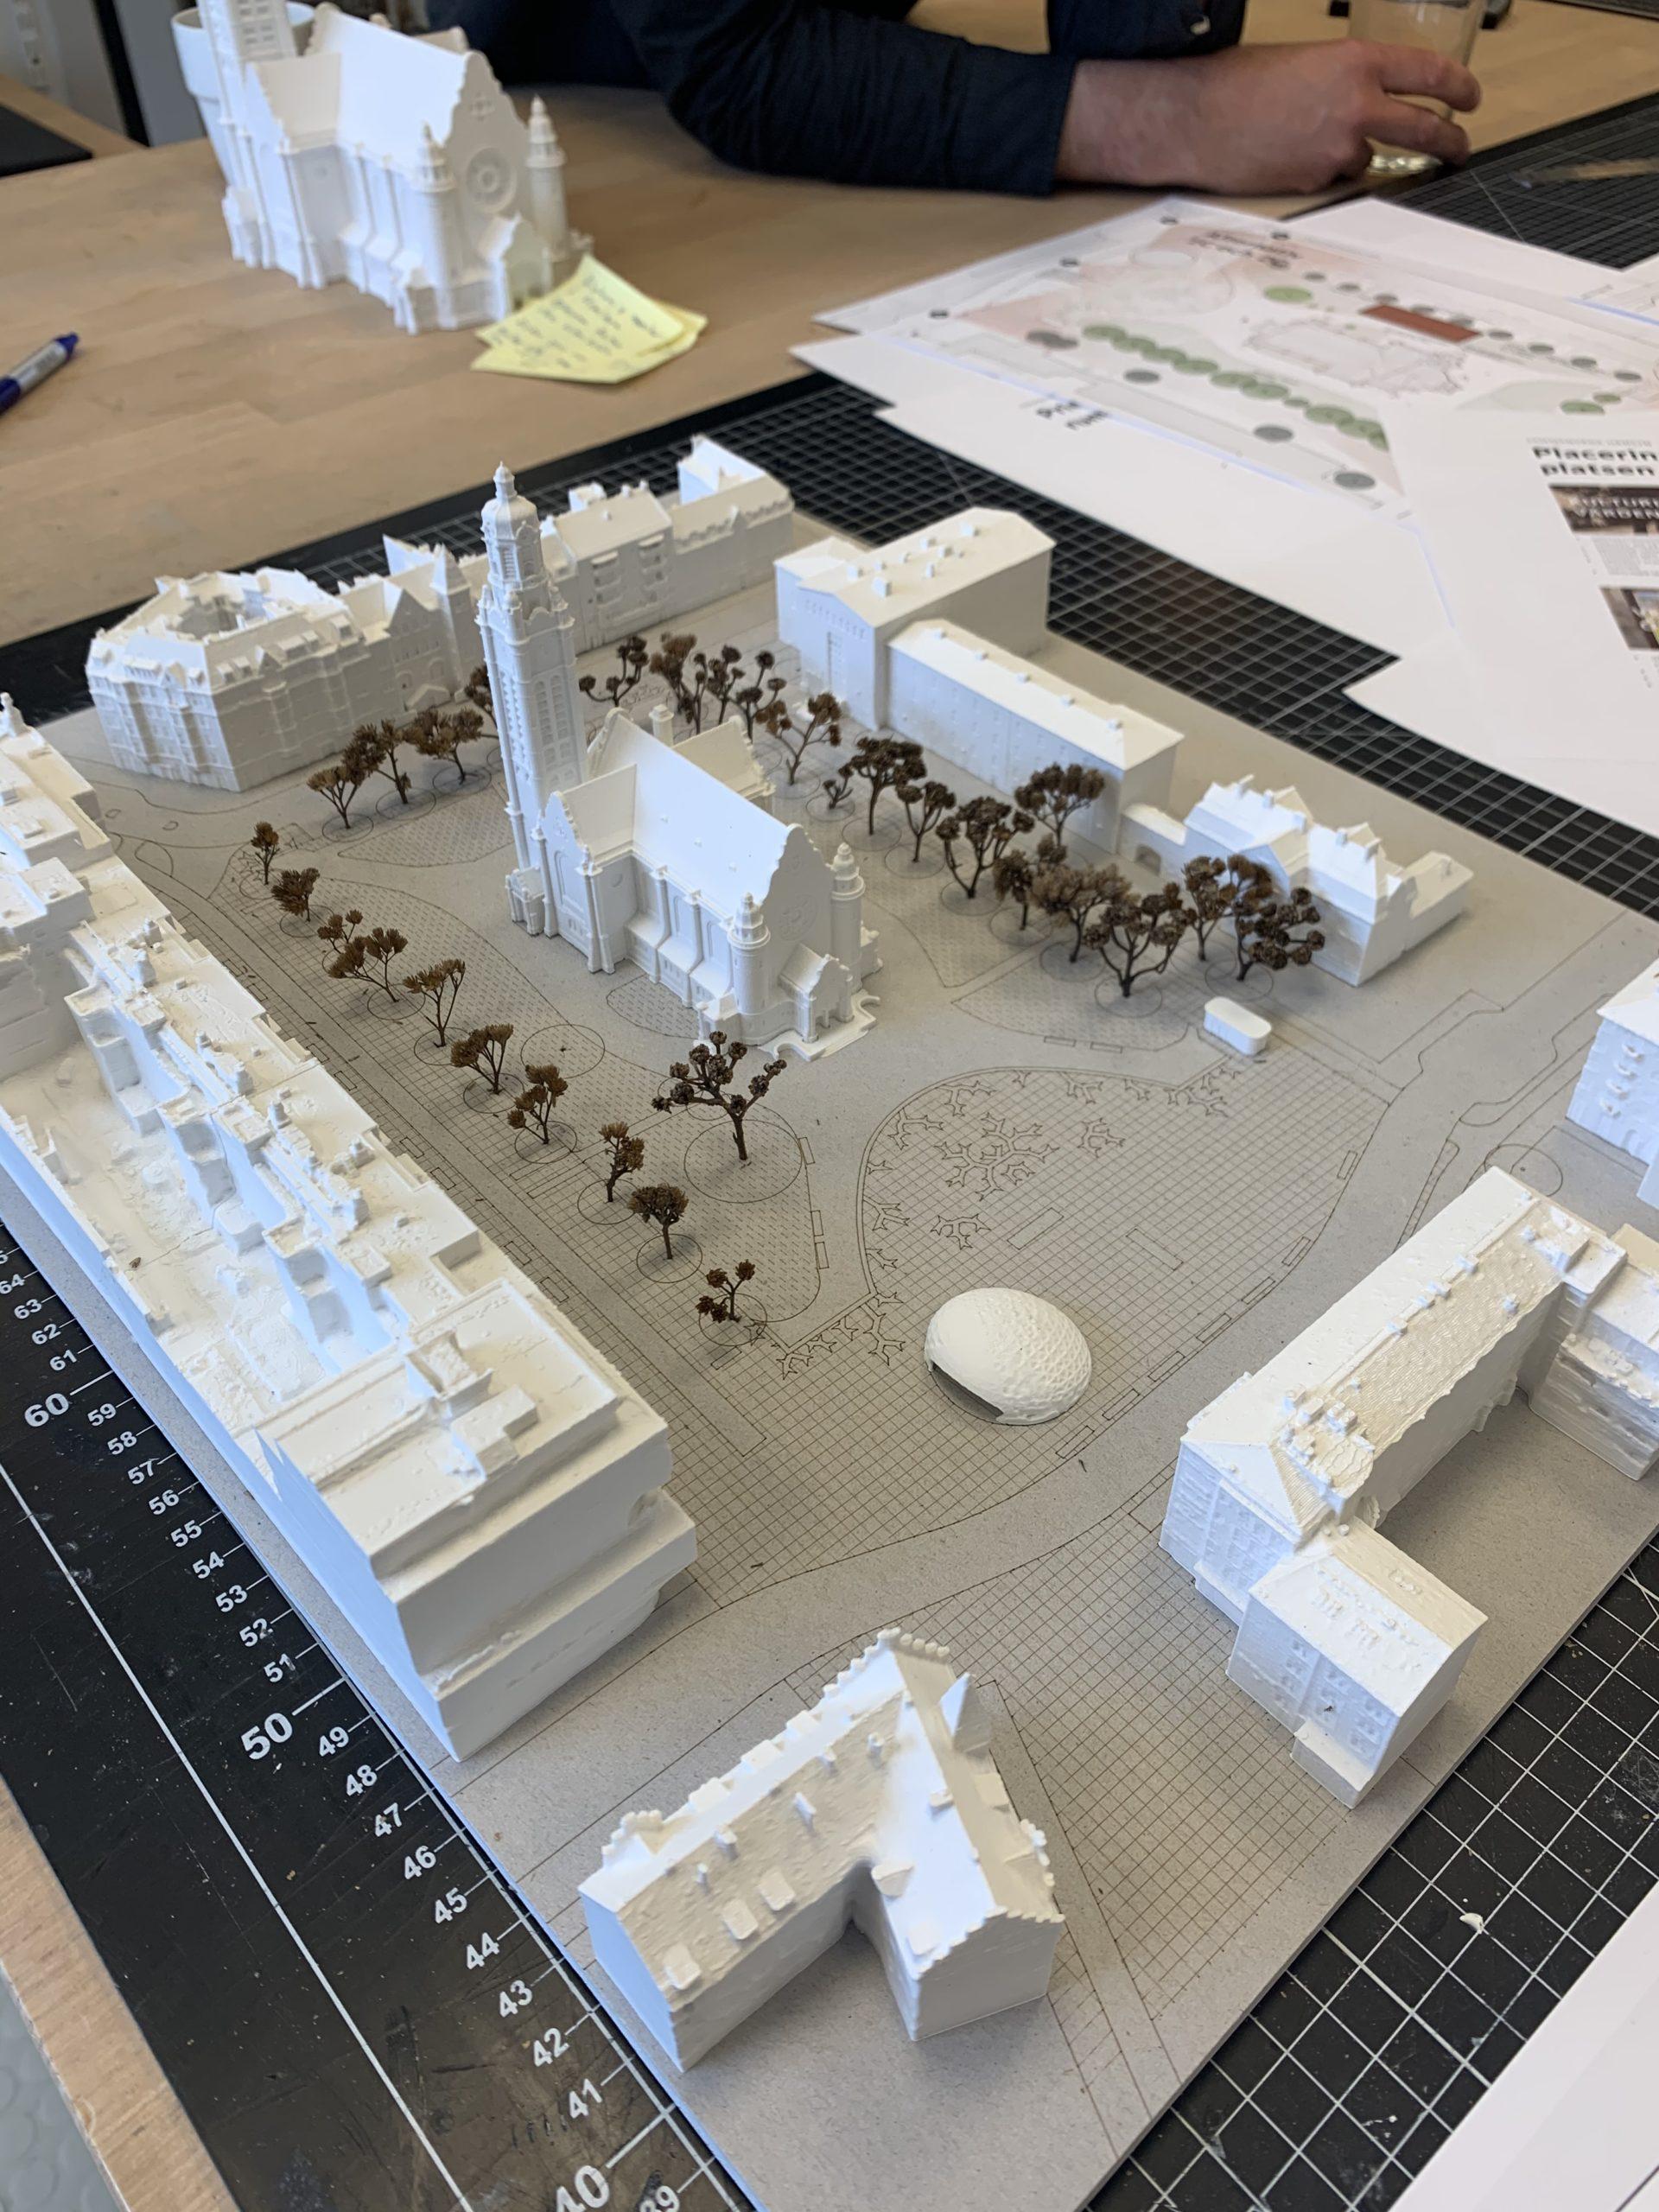 White arkitekter anlitar Swescan till 3D gestaltning